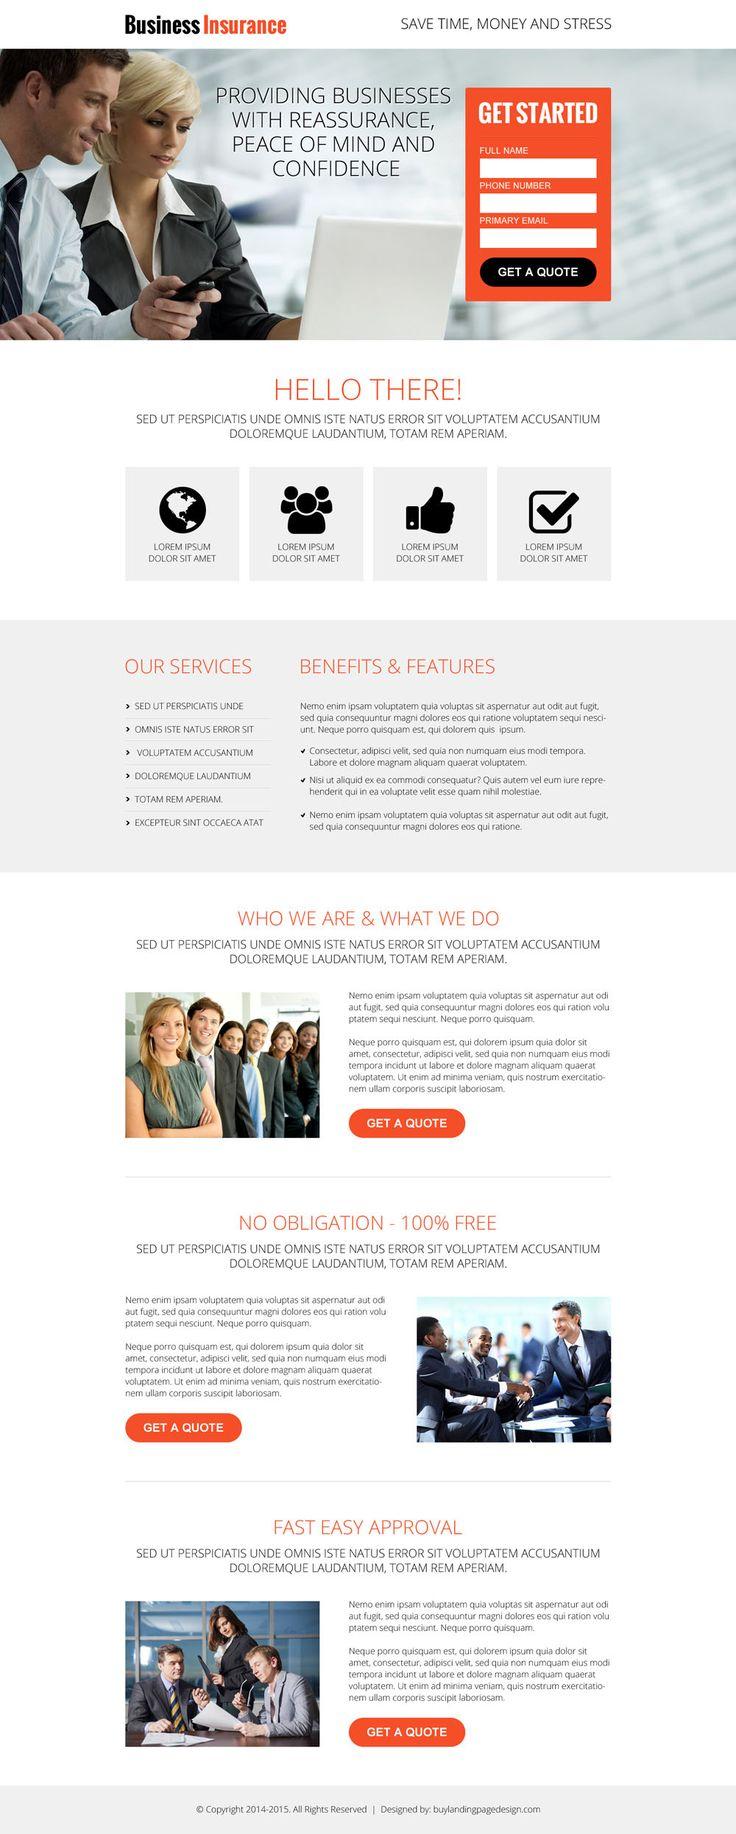 business insurance lead capture responsive landing page design